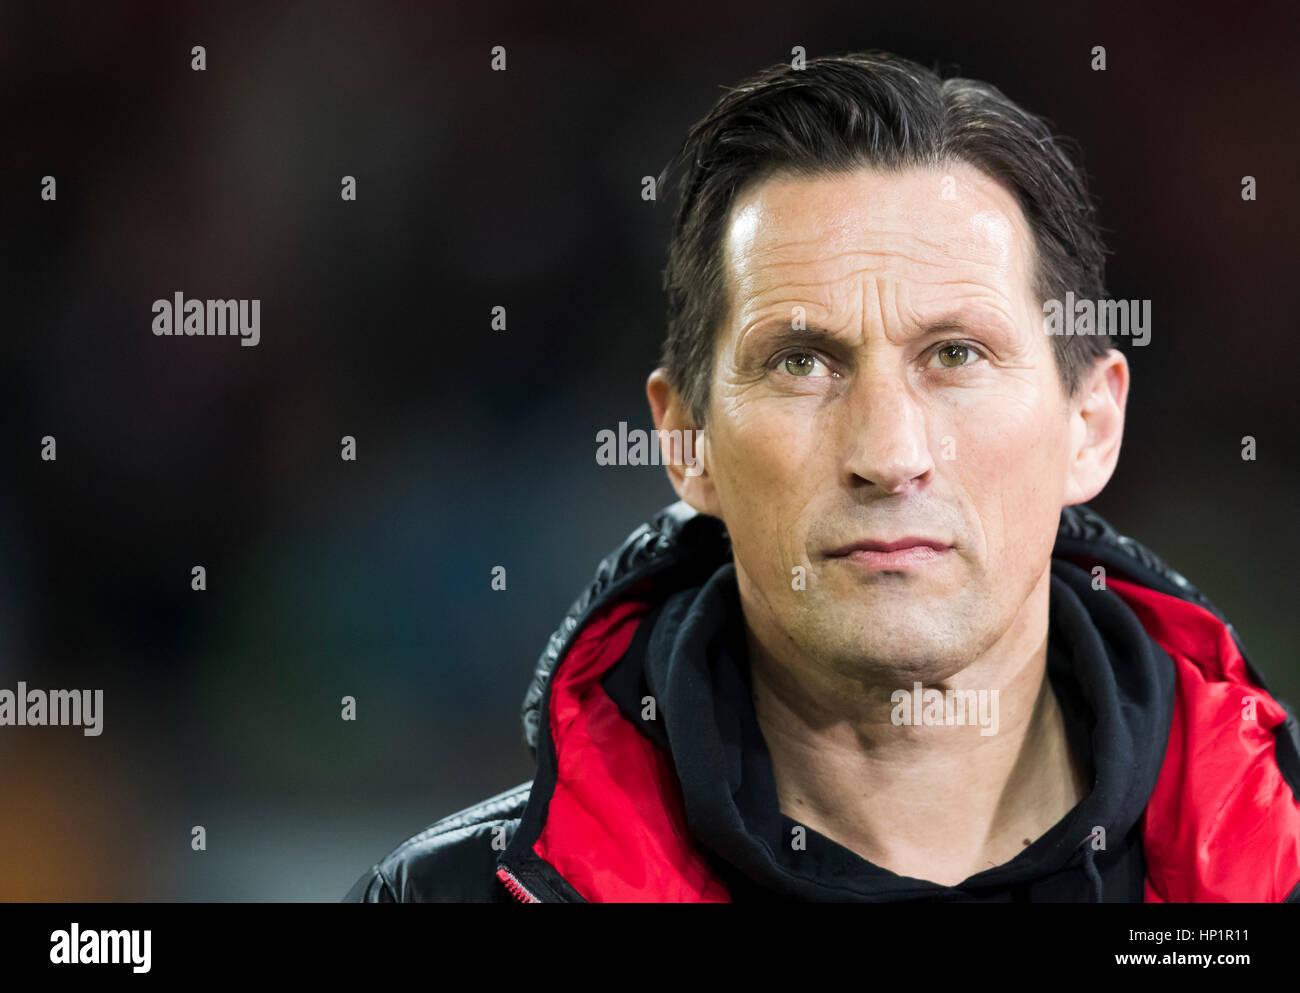 Roger Schatz augsburg germany 17 th february 2017 leverkusen coach roger